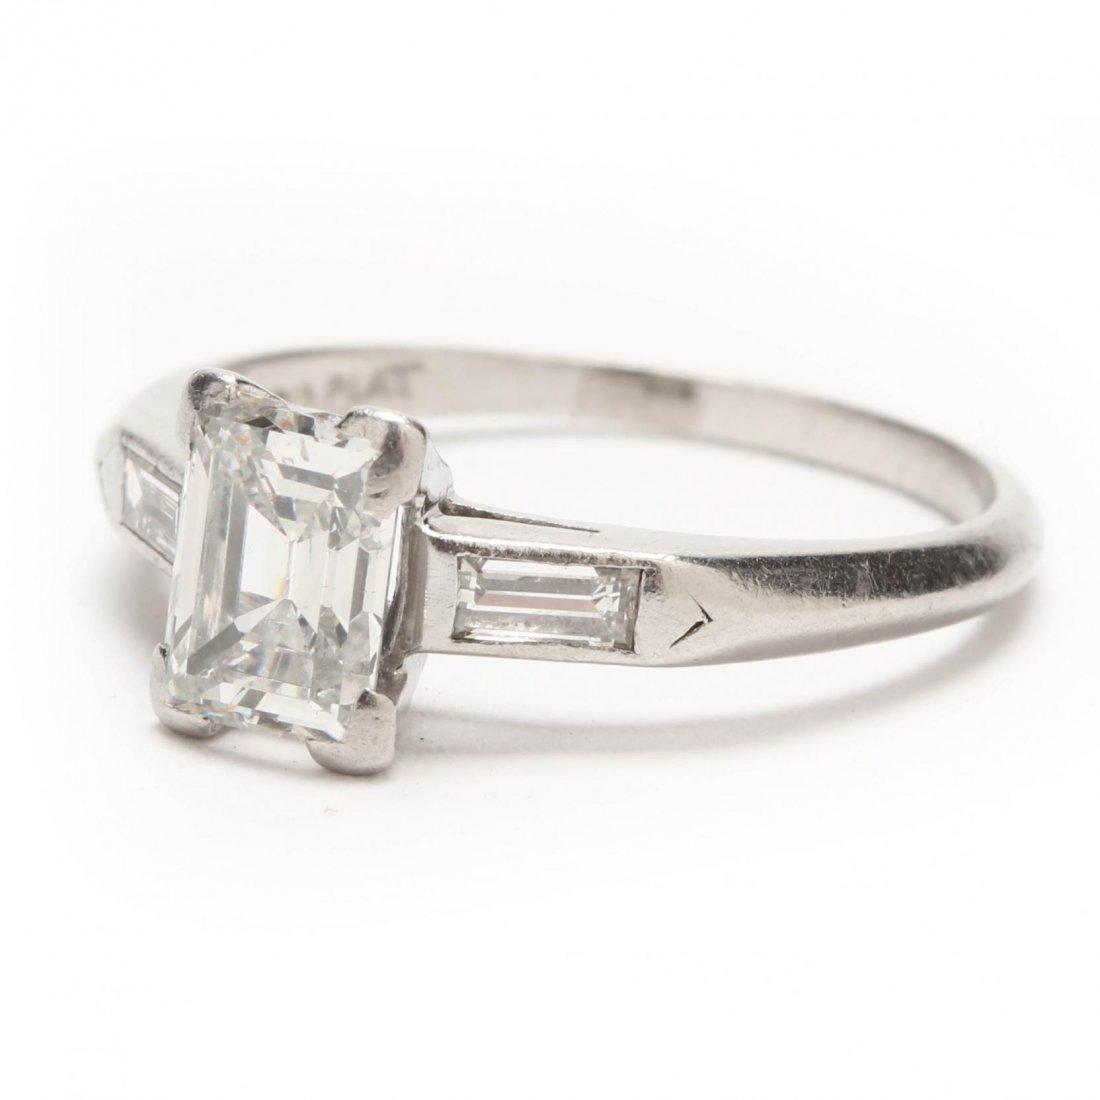 Platinum and Diamond Ring - 10